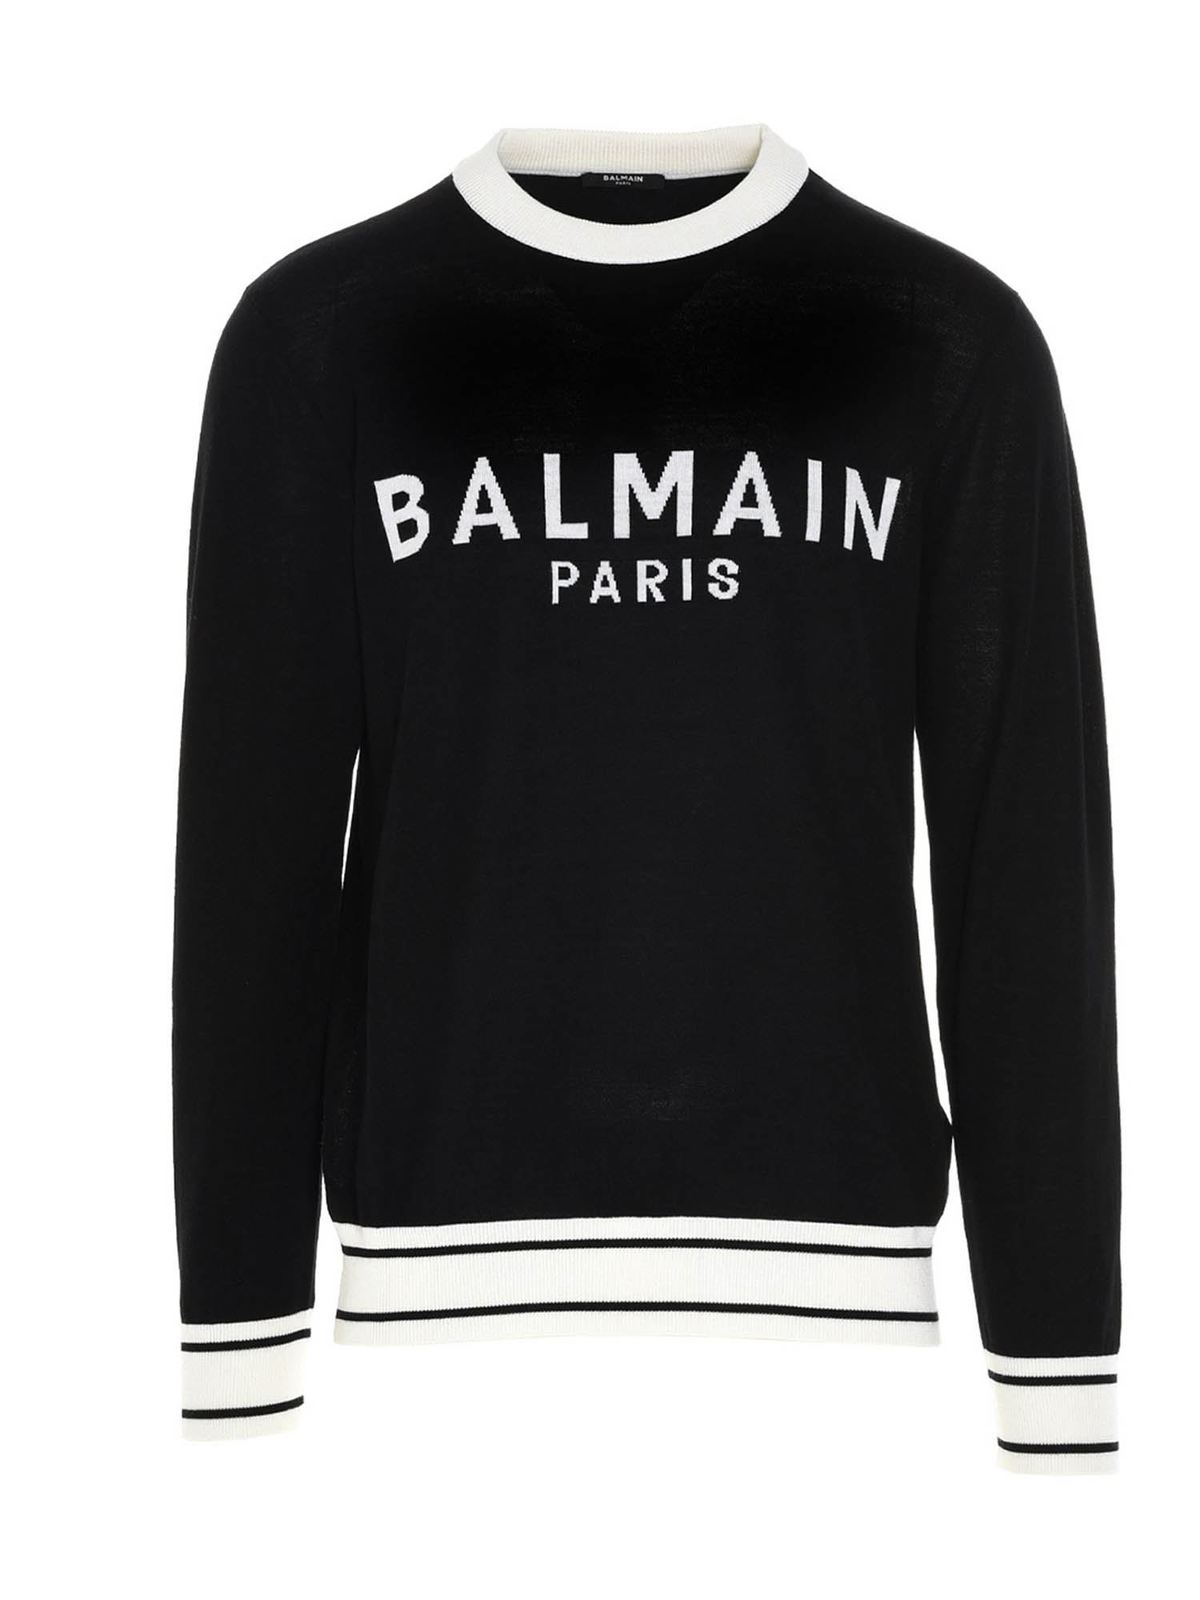 Balmain LOGO SWEATER IN BLACK